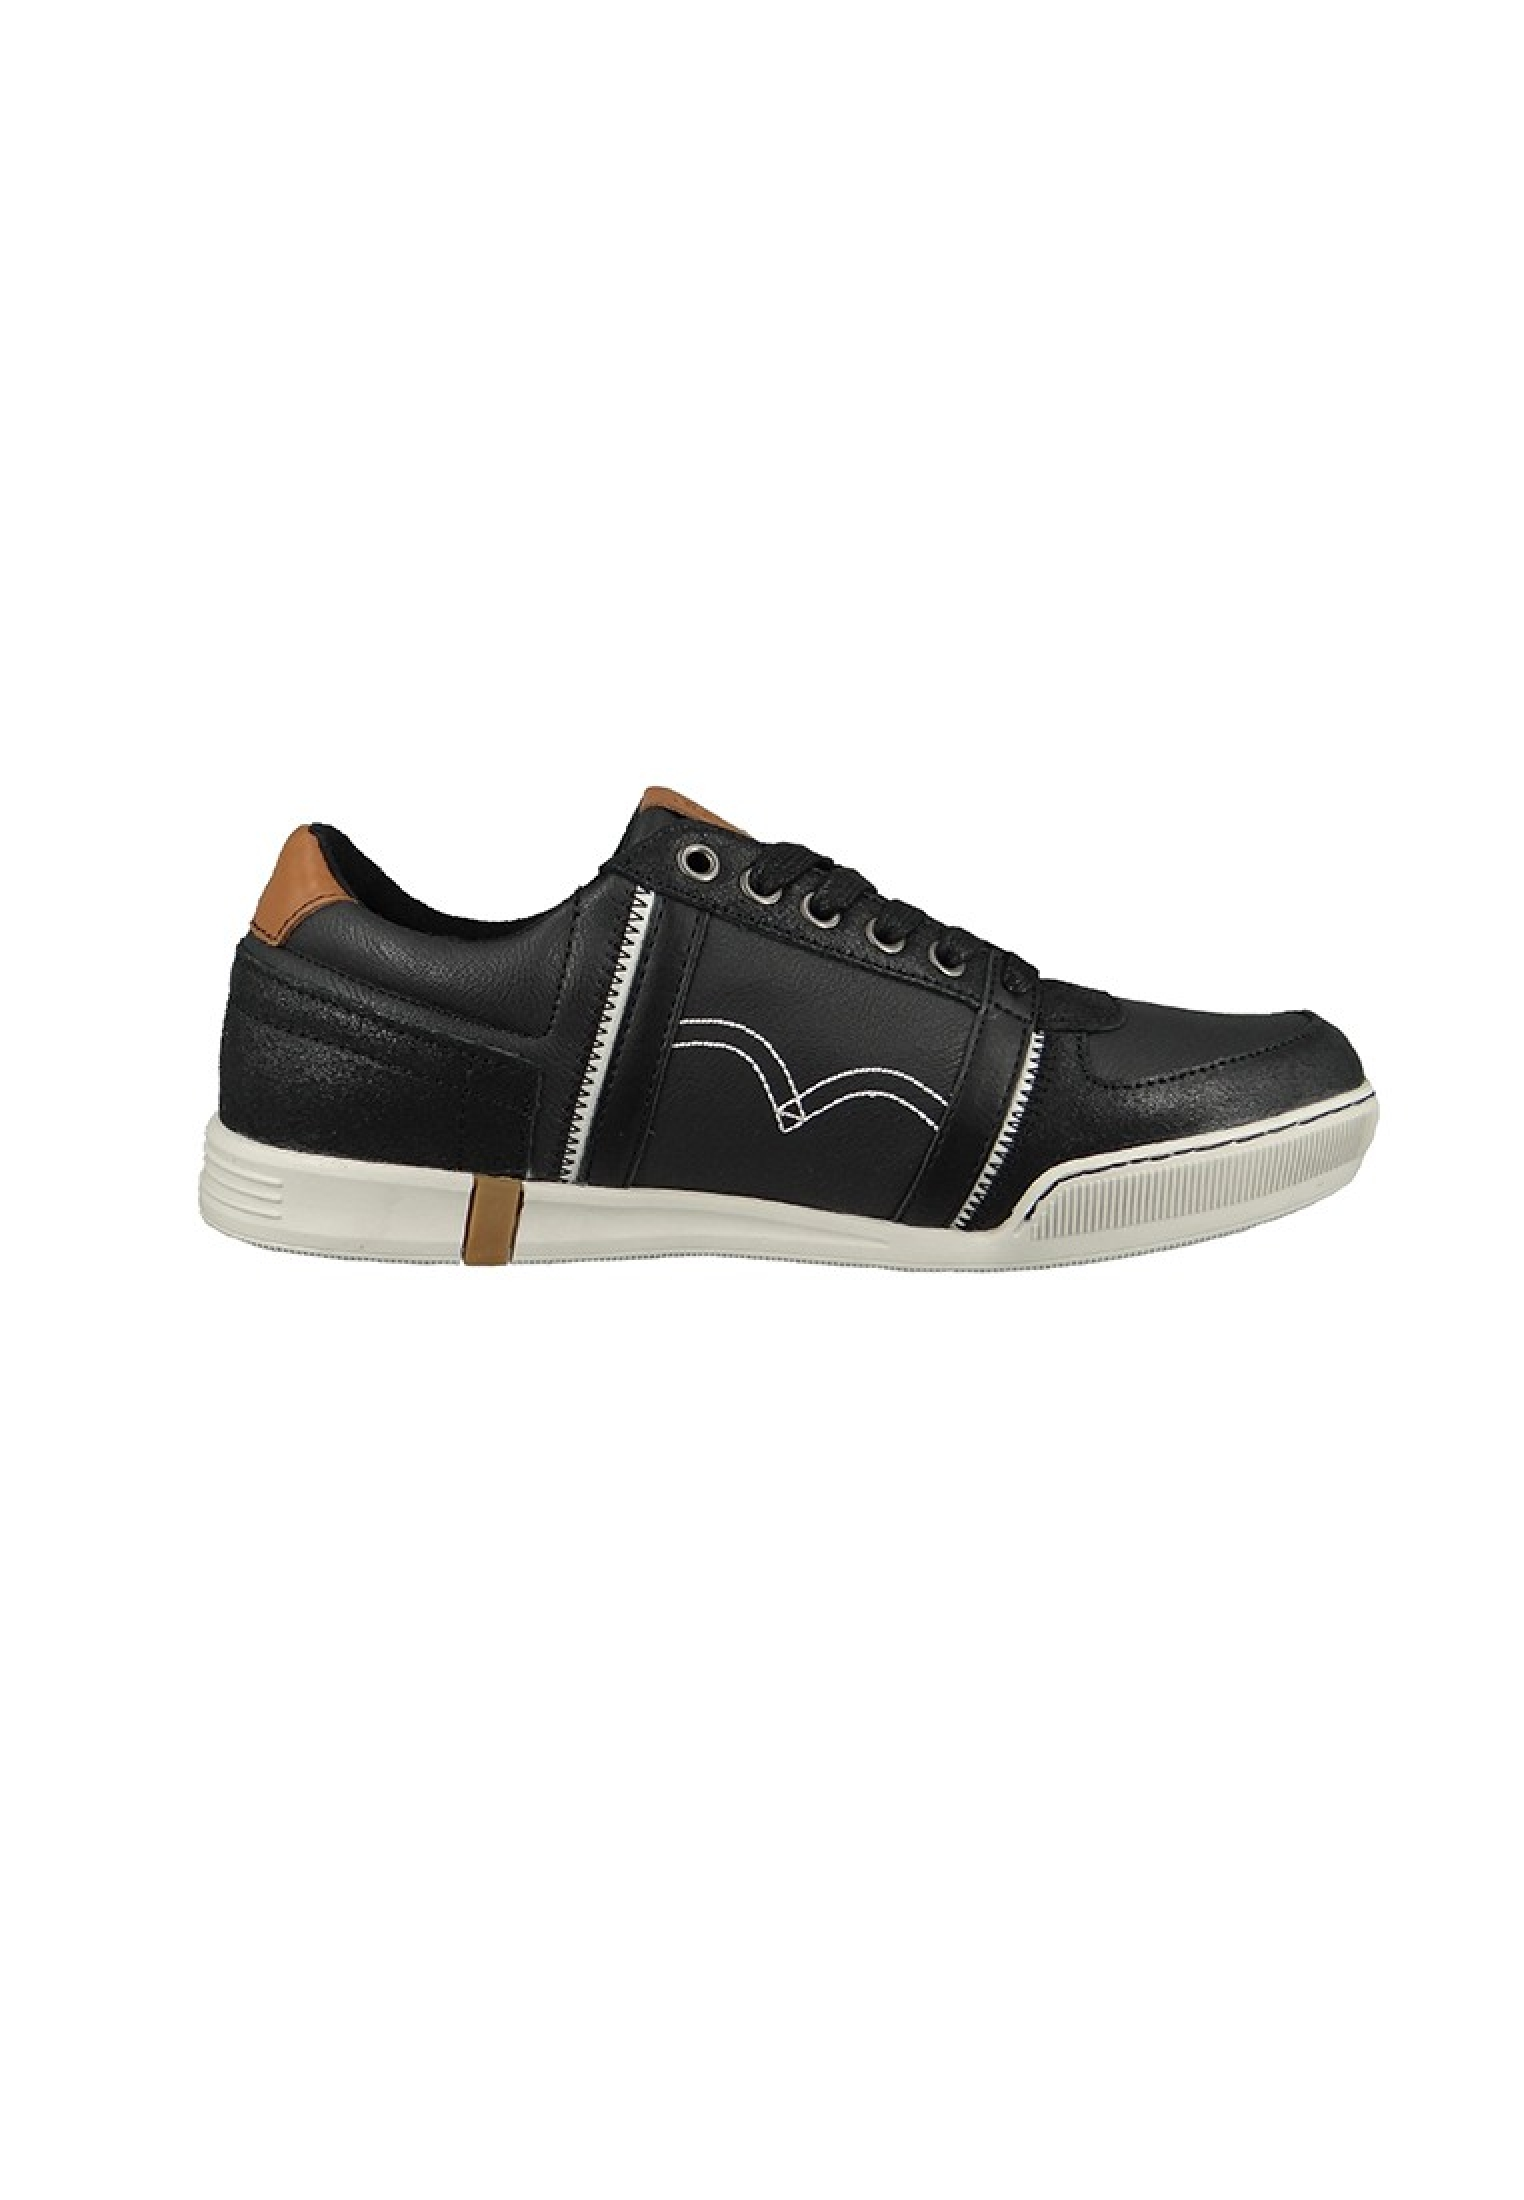 levis schuhe sneaker tioga regular black schwarz 226793. Black Bedroom Furniture Sets. Home Design Ideas